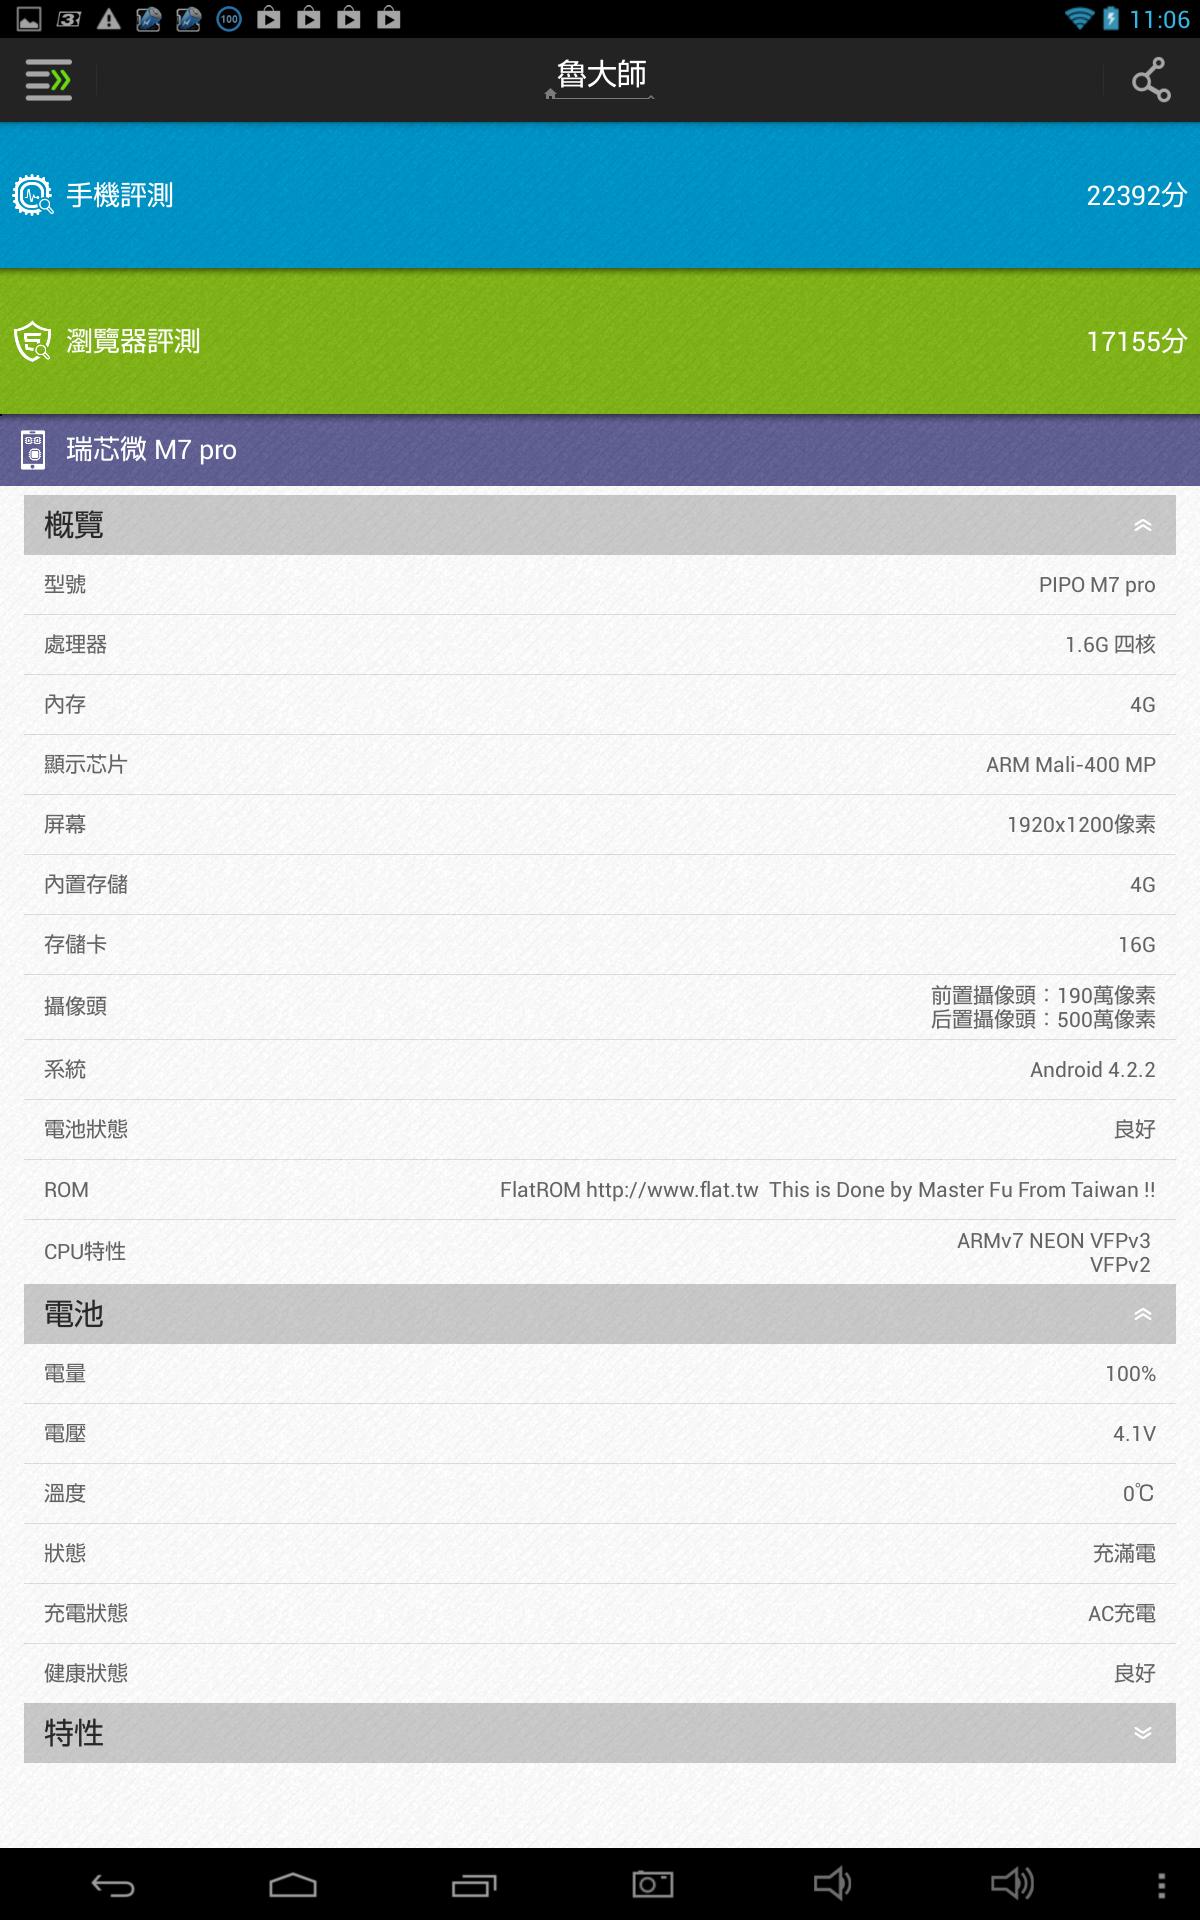 Screenshot_2013-08-07-11-06-40.png